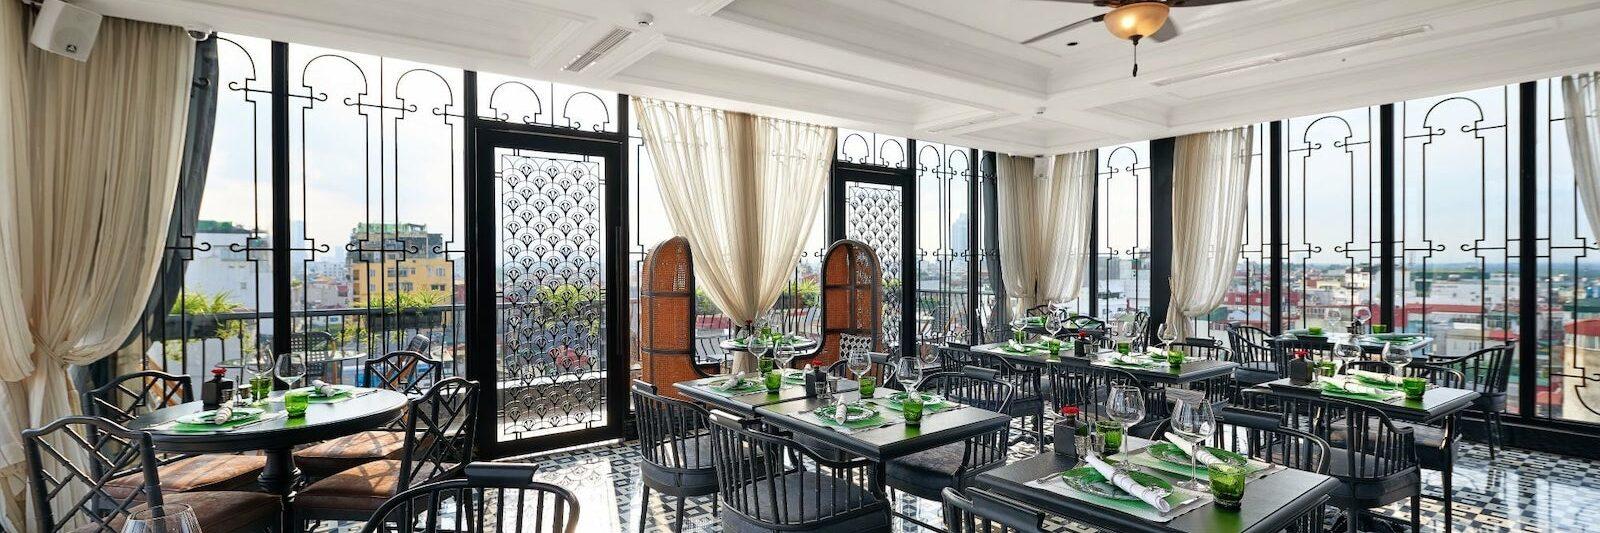 Image of a restaurant in the La Siesta Premium Hang Be in Hanoi, Vietnam